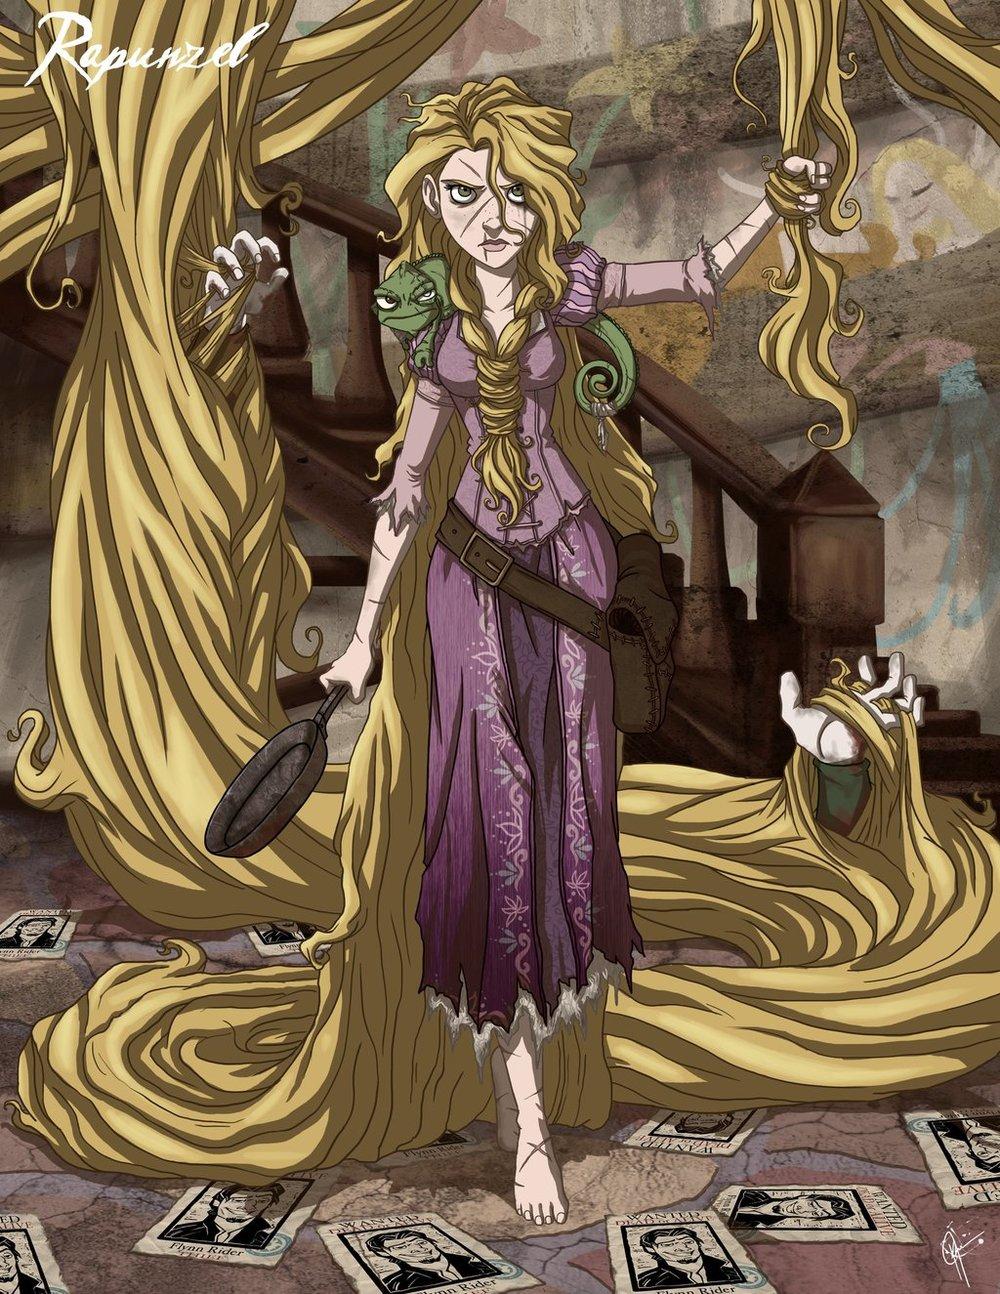 twisted_princess__rapunzel_by_jeftoon01-d35mvla.jpg